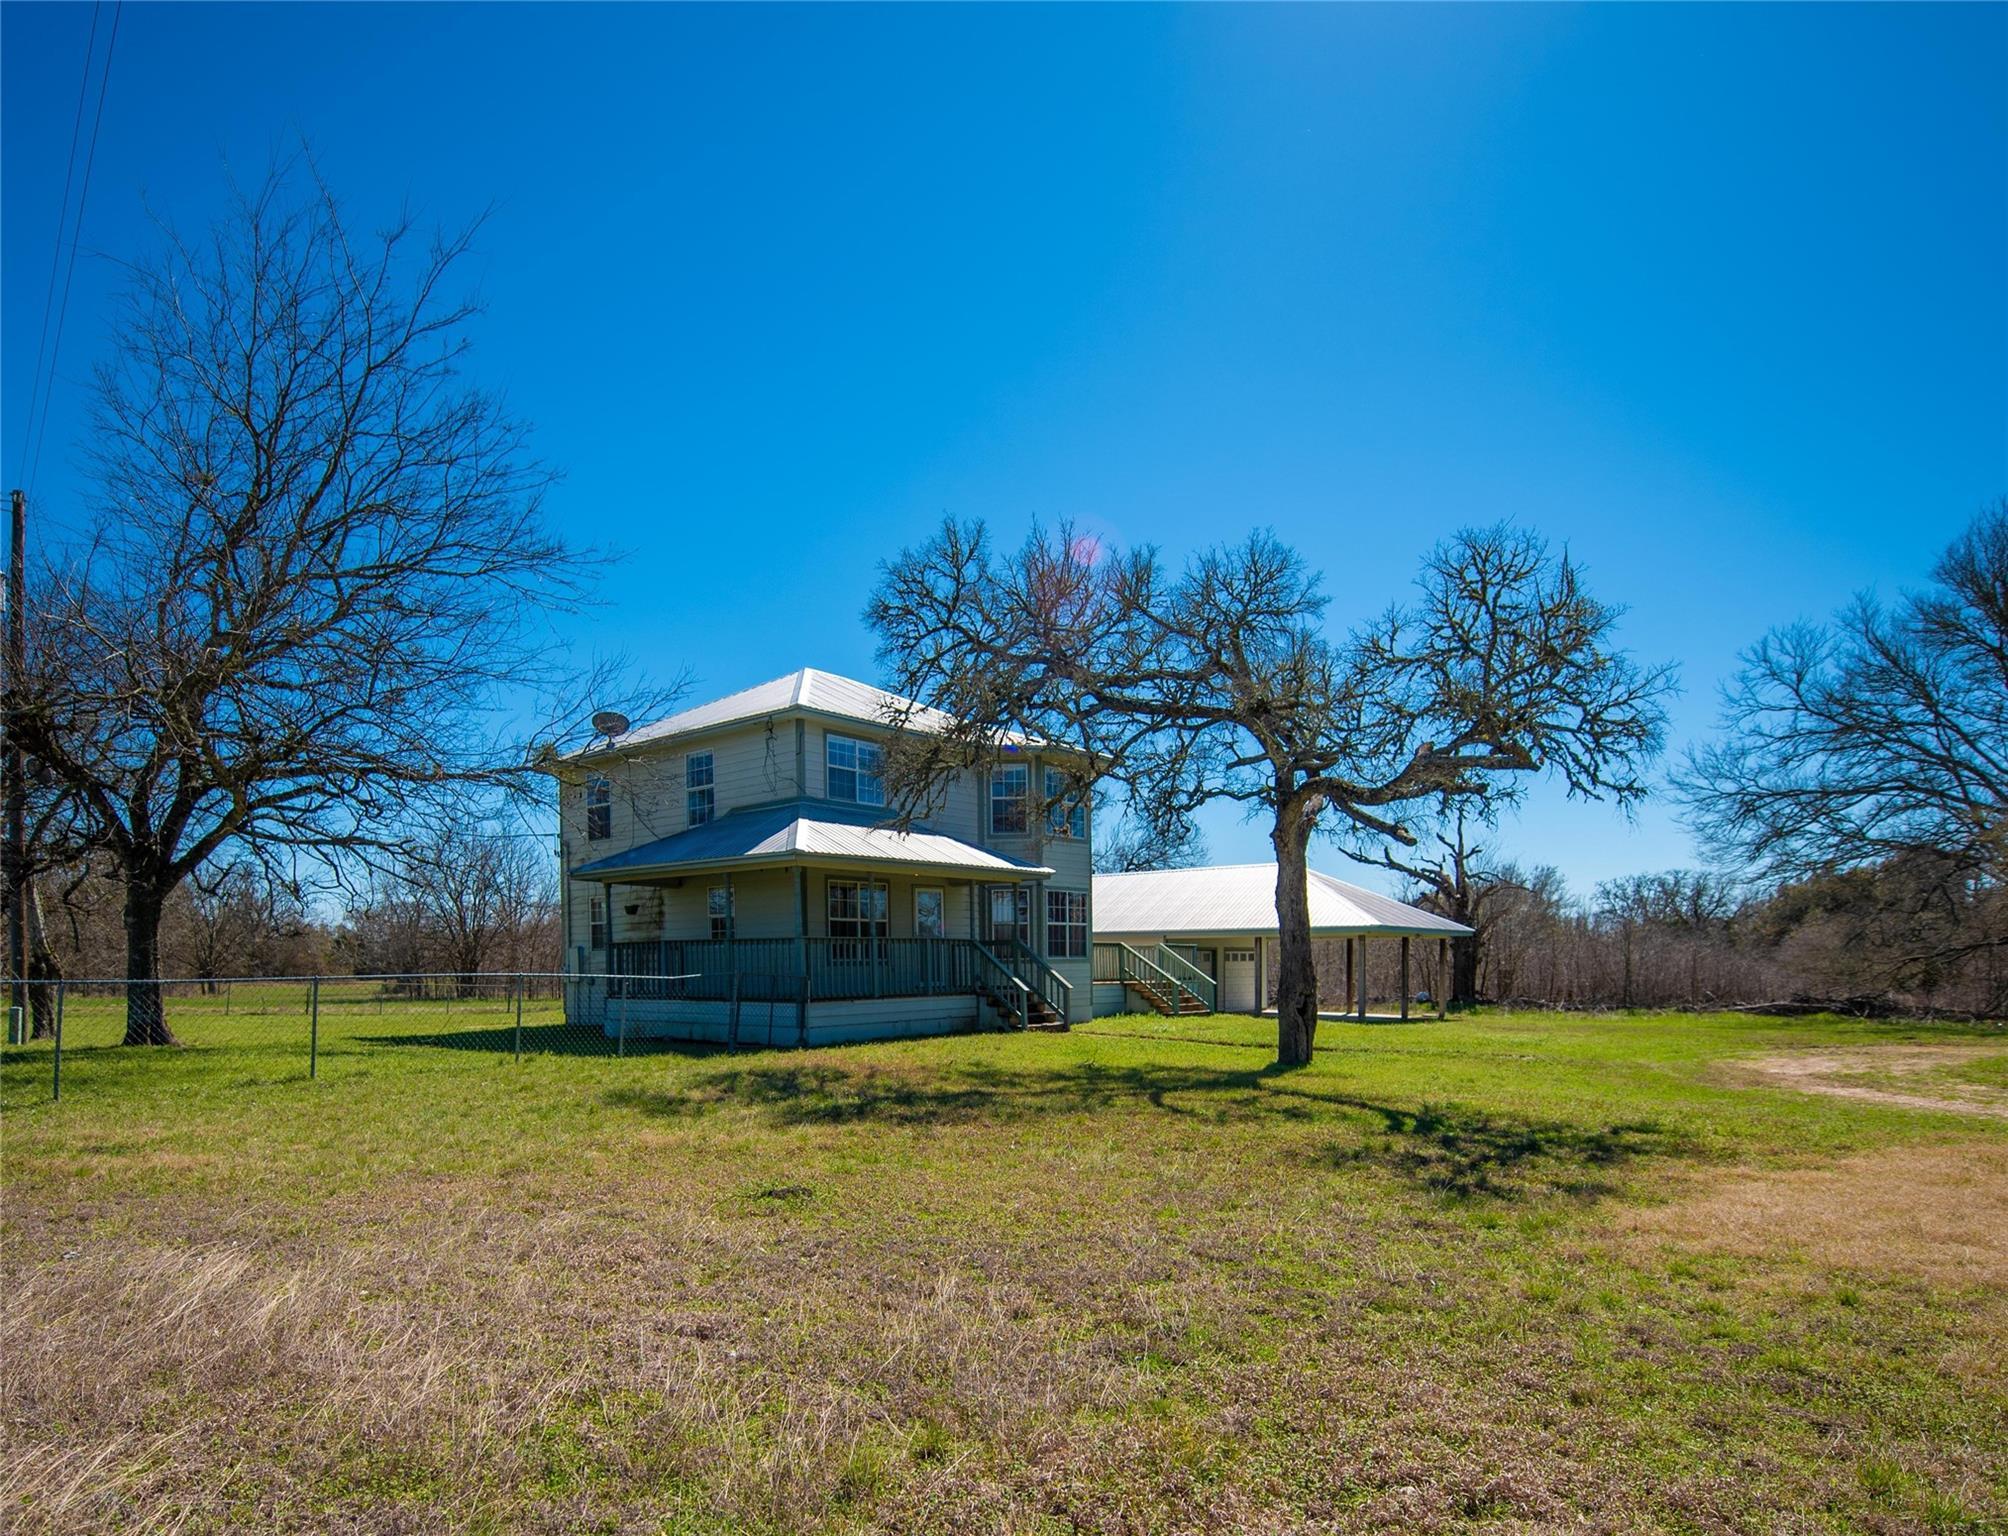 9110 Fm 2145 Property Photo - Ledbetter, TX real estate listing